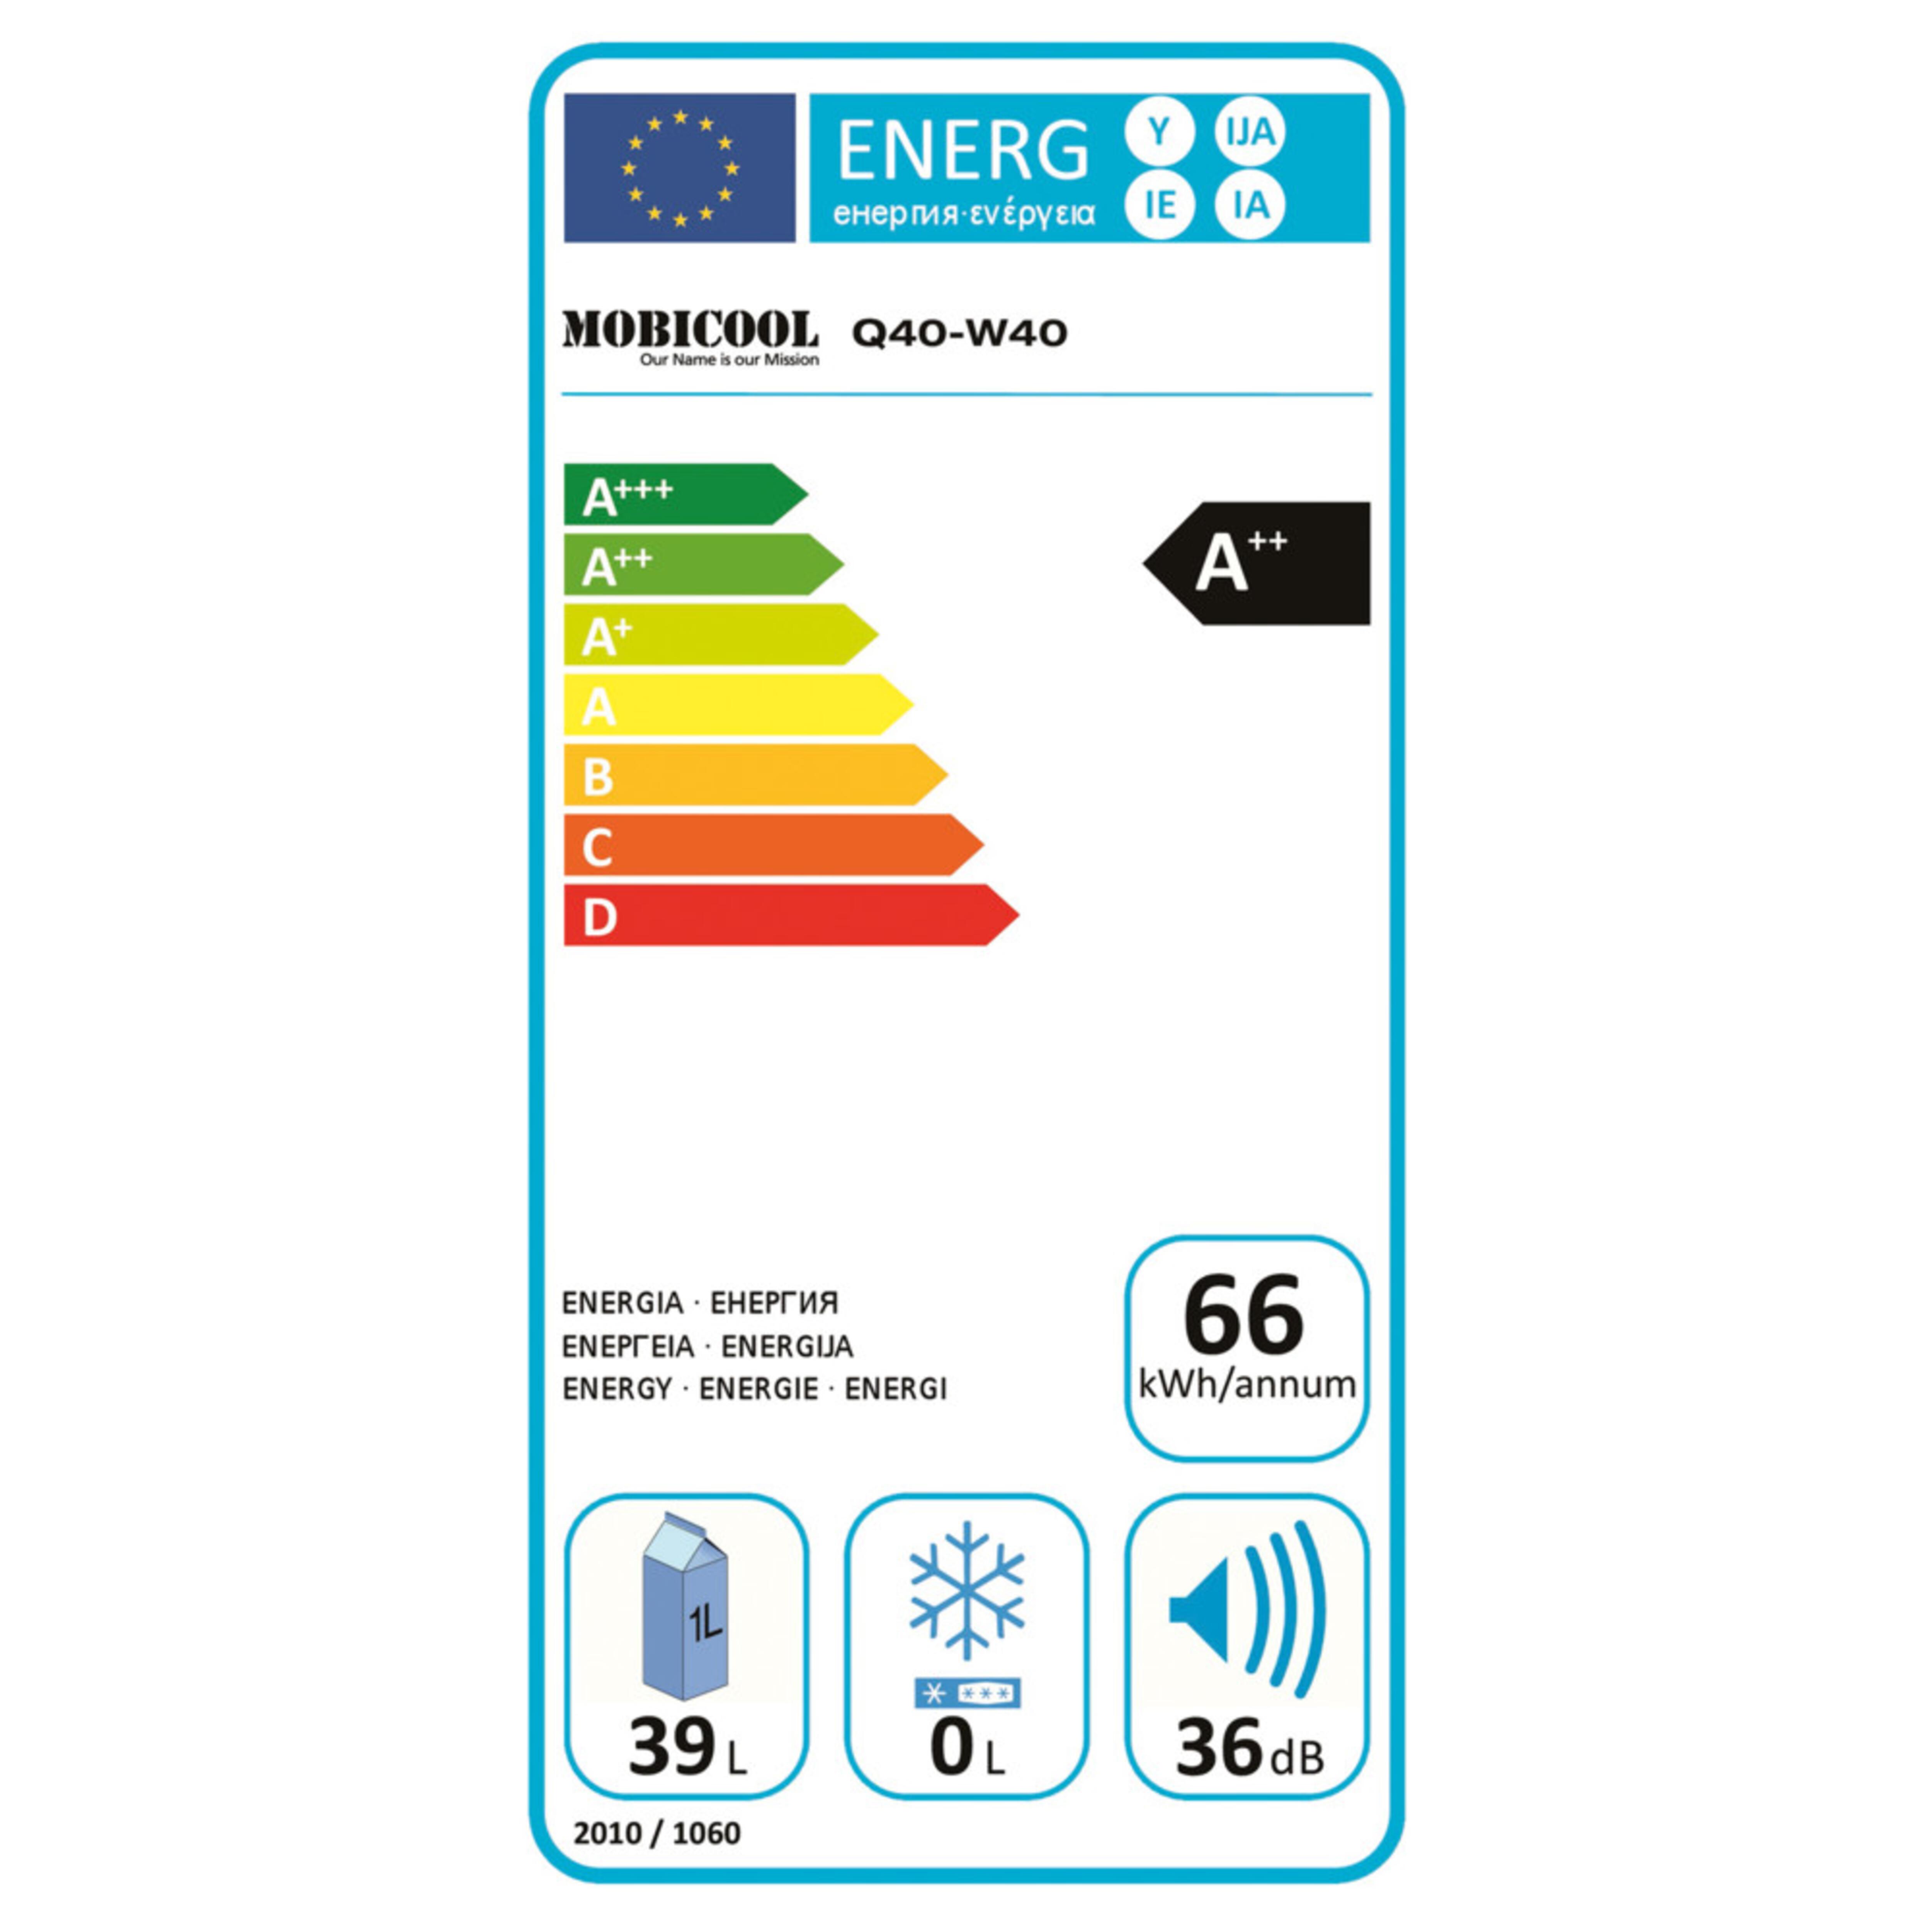 Mobicool W40 Energy label